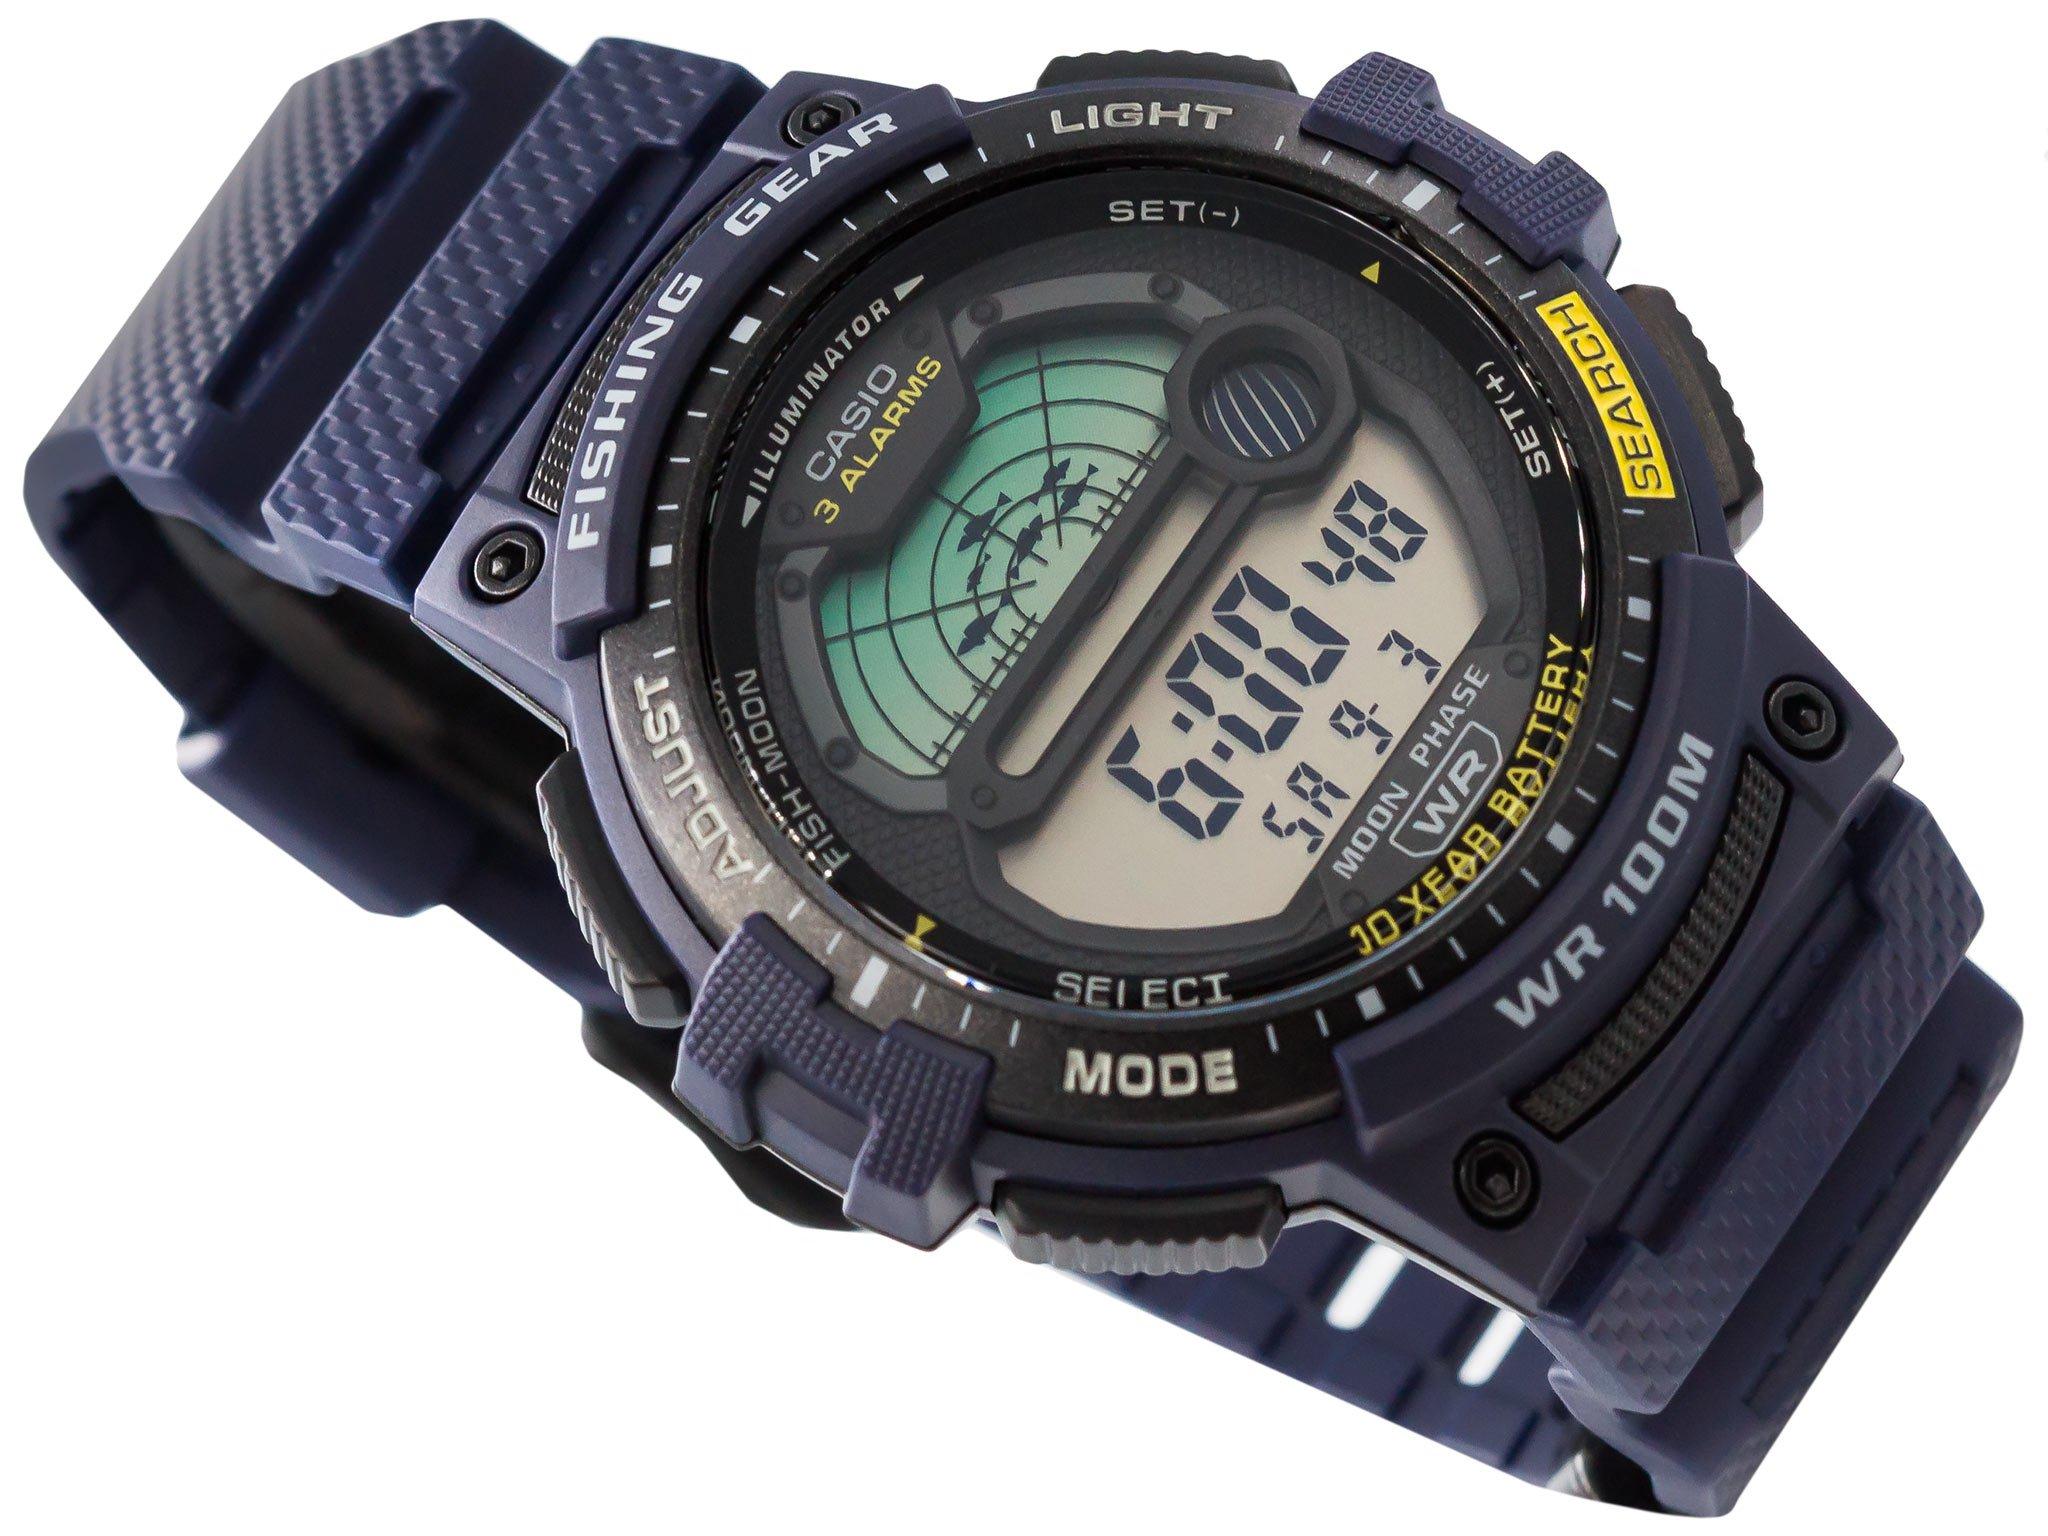 Zegarek Casio WS-1200H-2AV